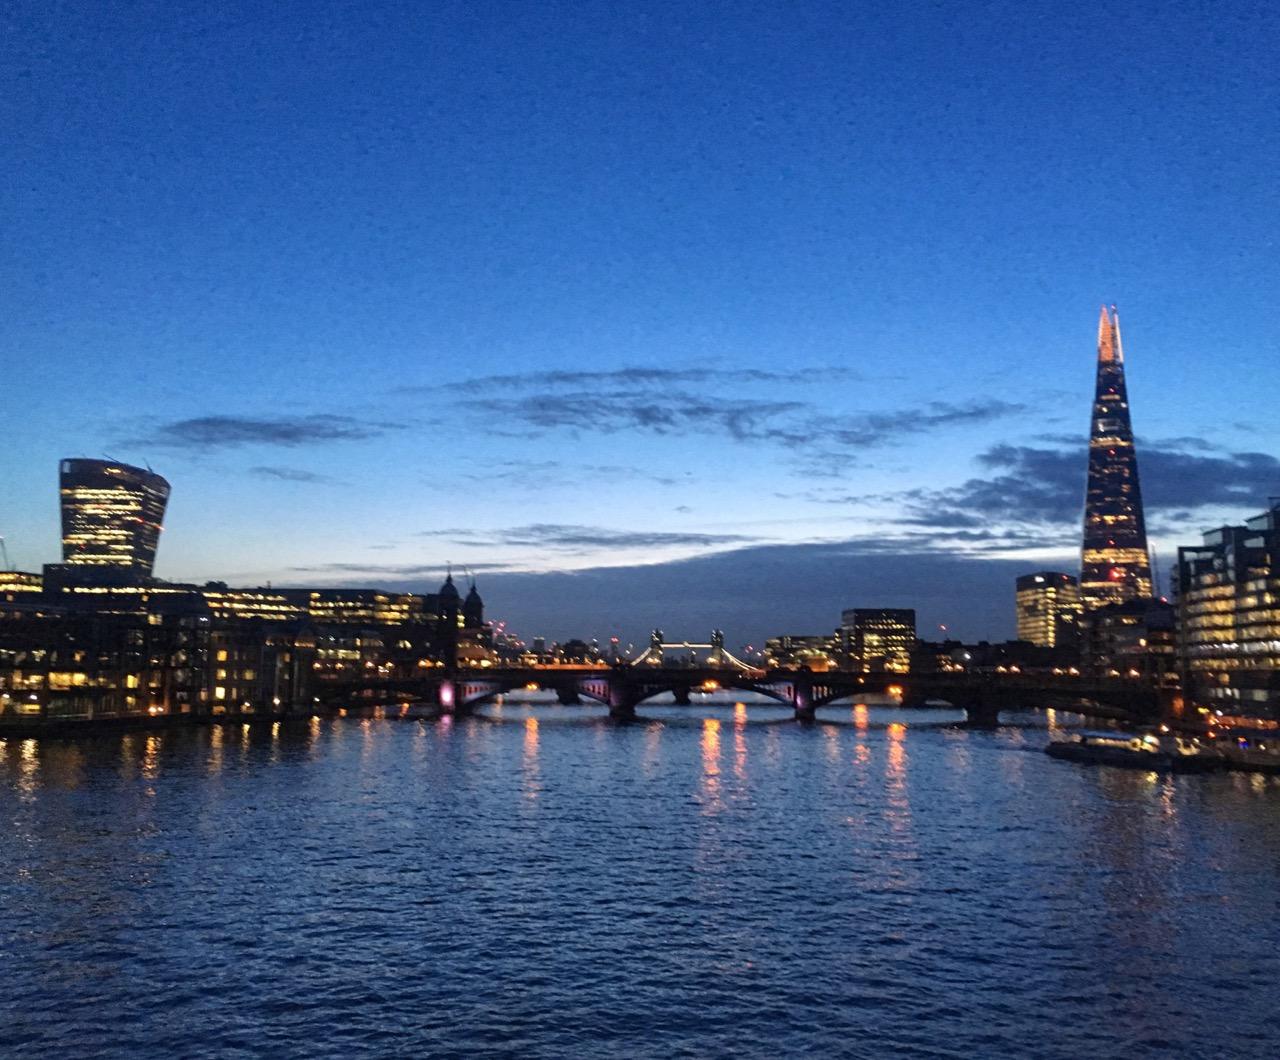 Sunrise, London